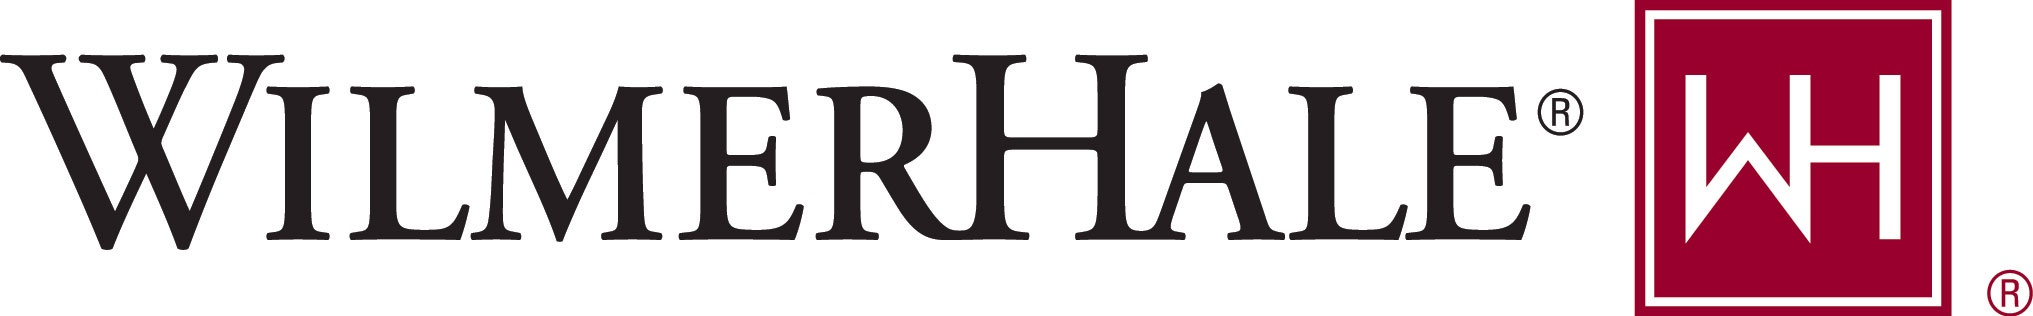 WilmerHale logo Color Signature.